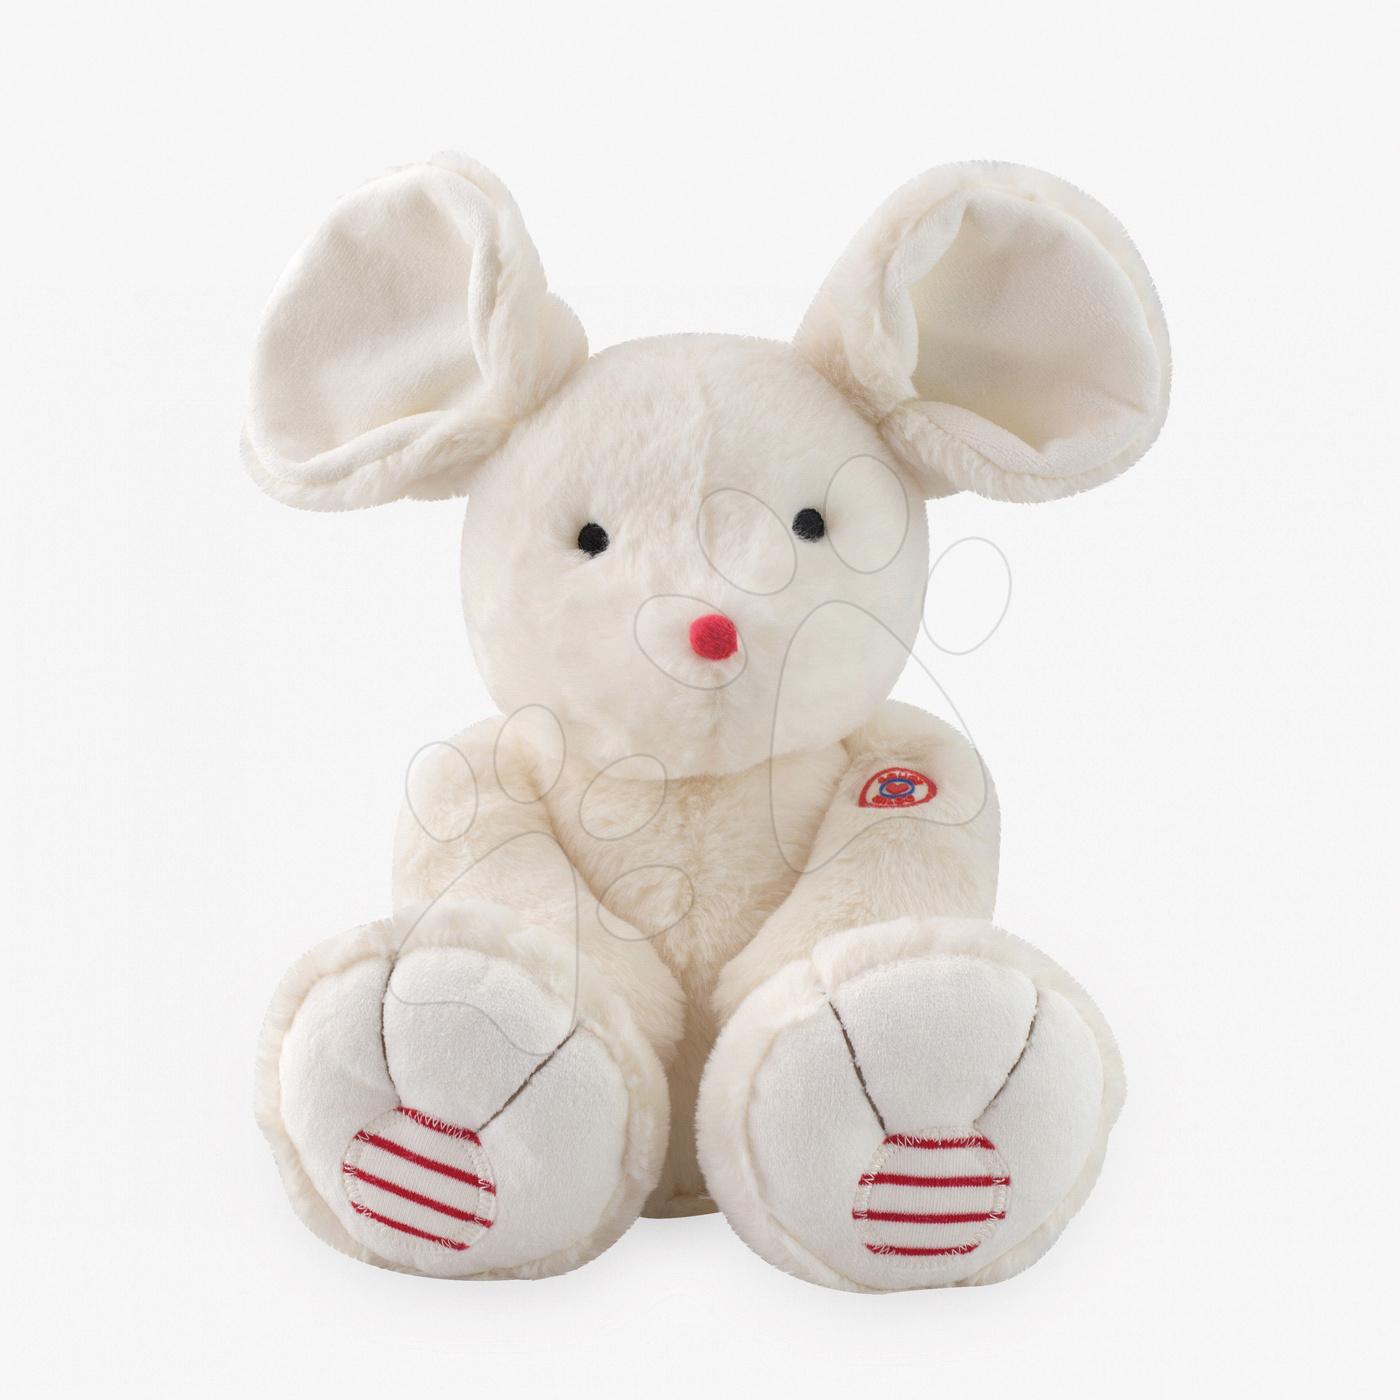 Plyšové zvieratká - Plyšová myška Rouge Kaloo 38 cm pre najmenších krémová